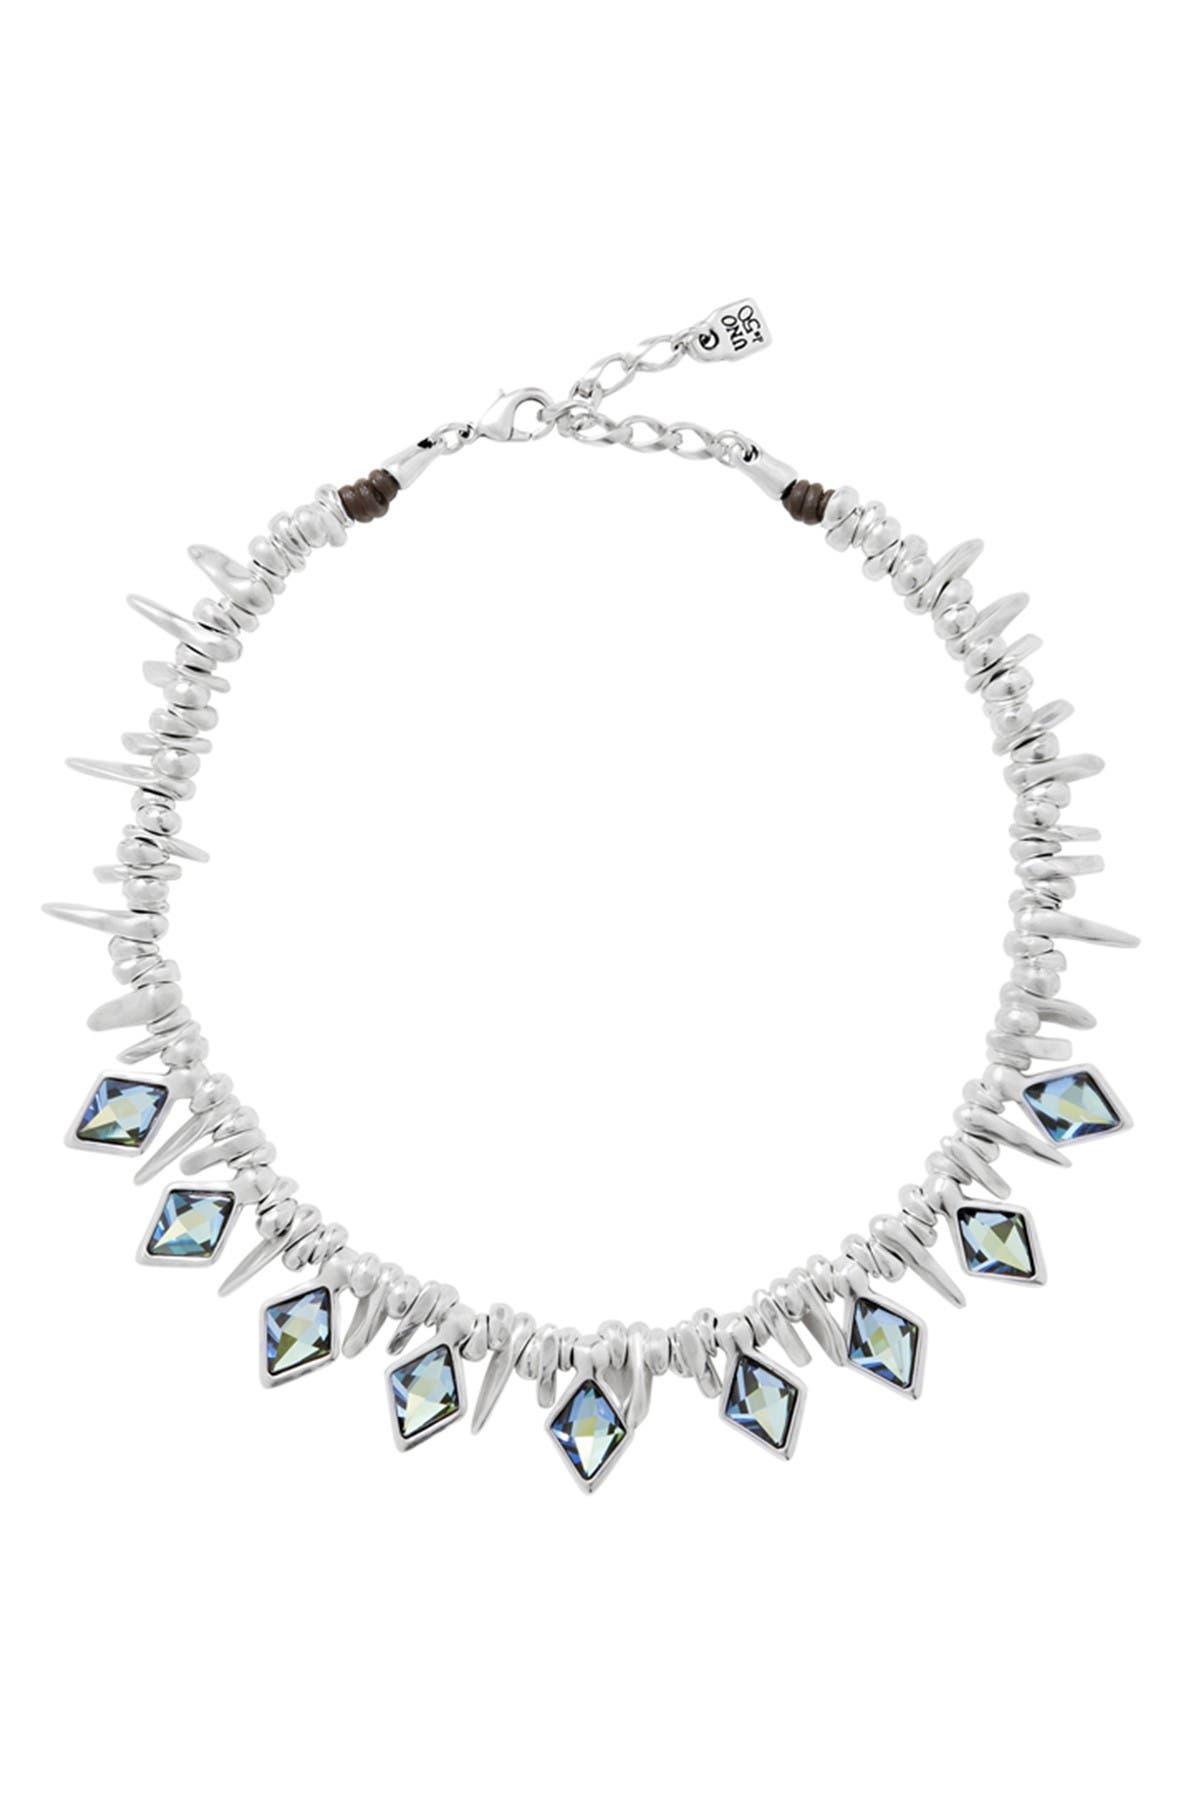 Image of Uno De 50 Stalactite Diamond Shape Bezel Set Swarovski Element Accented Collar Necklace